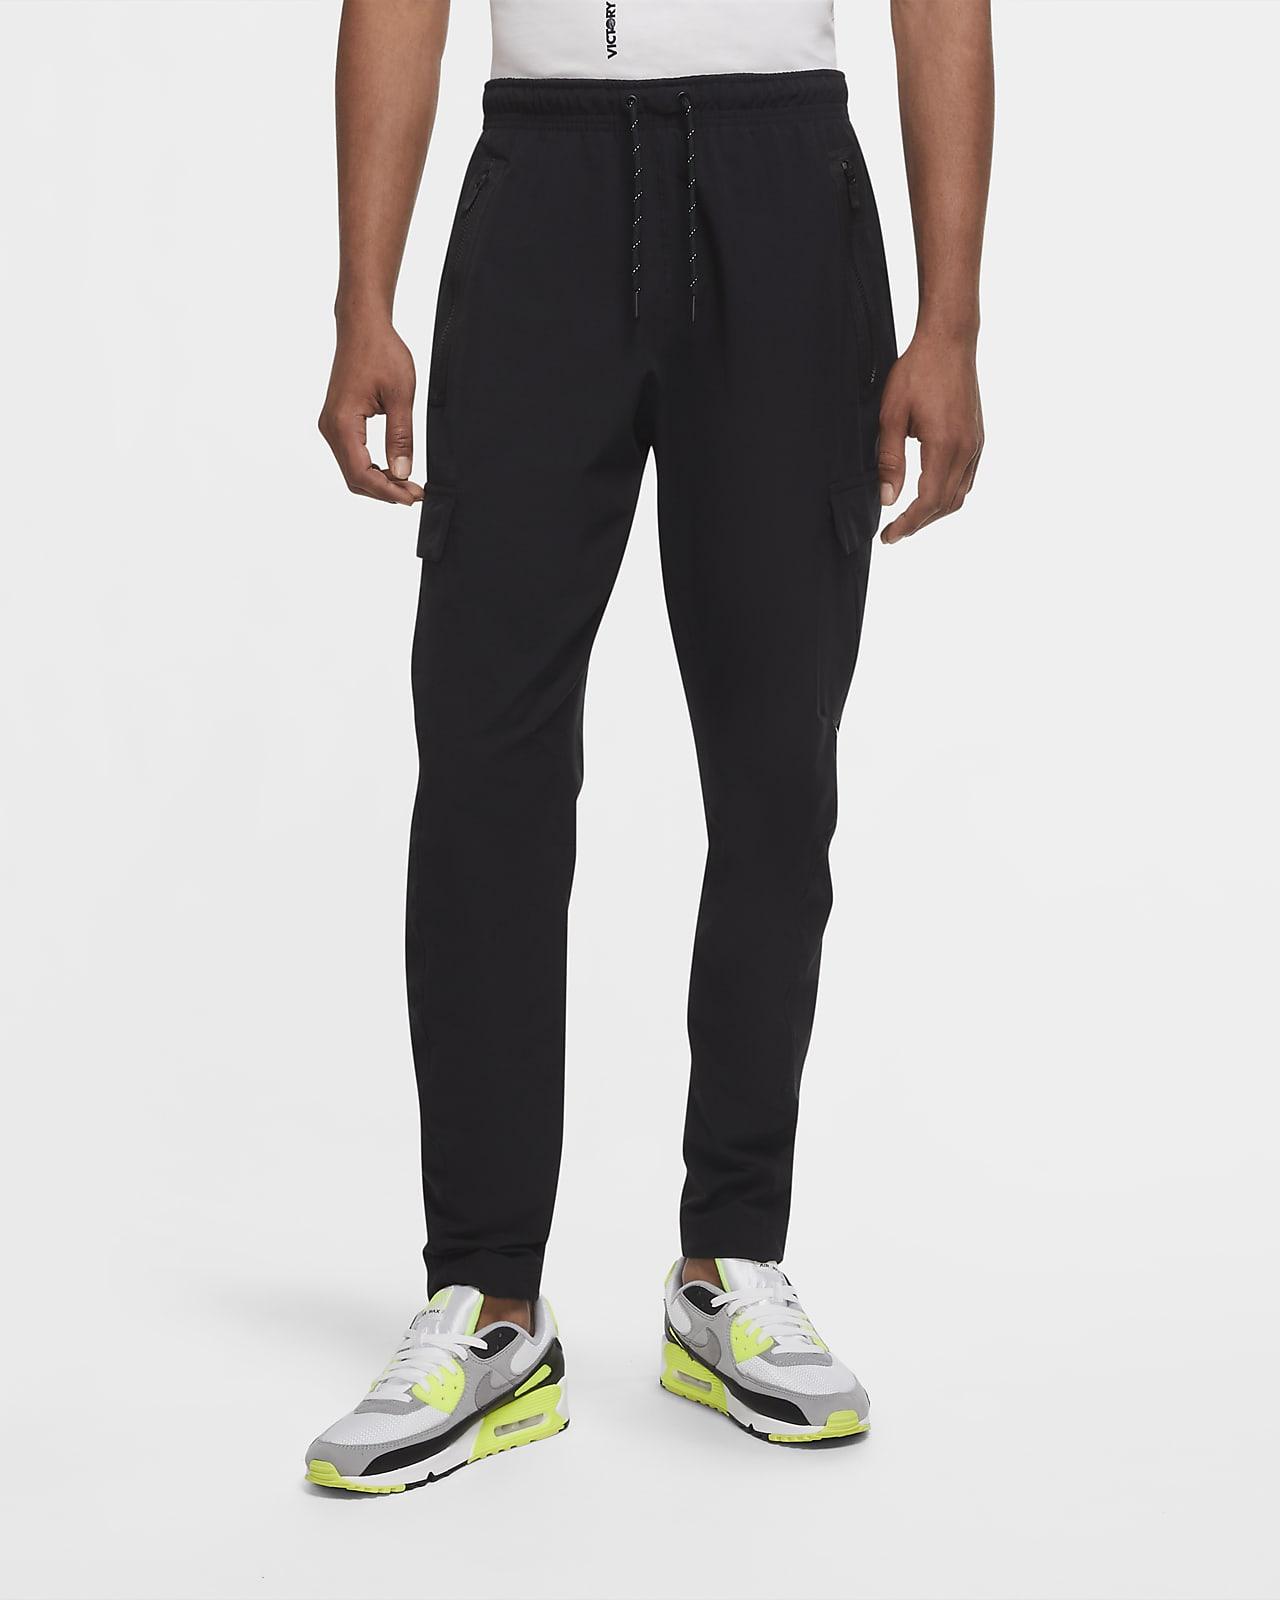 Nike Sportswear Air Max Pantalons Cargo de teixit Woven - Home